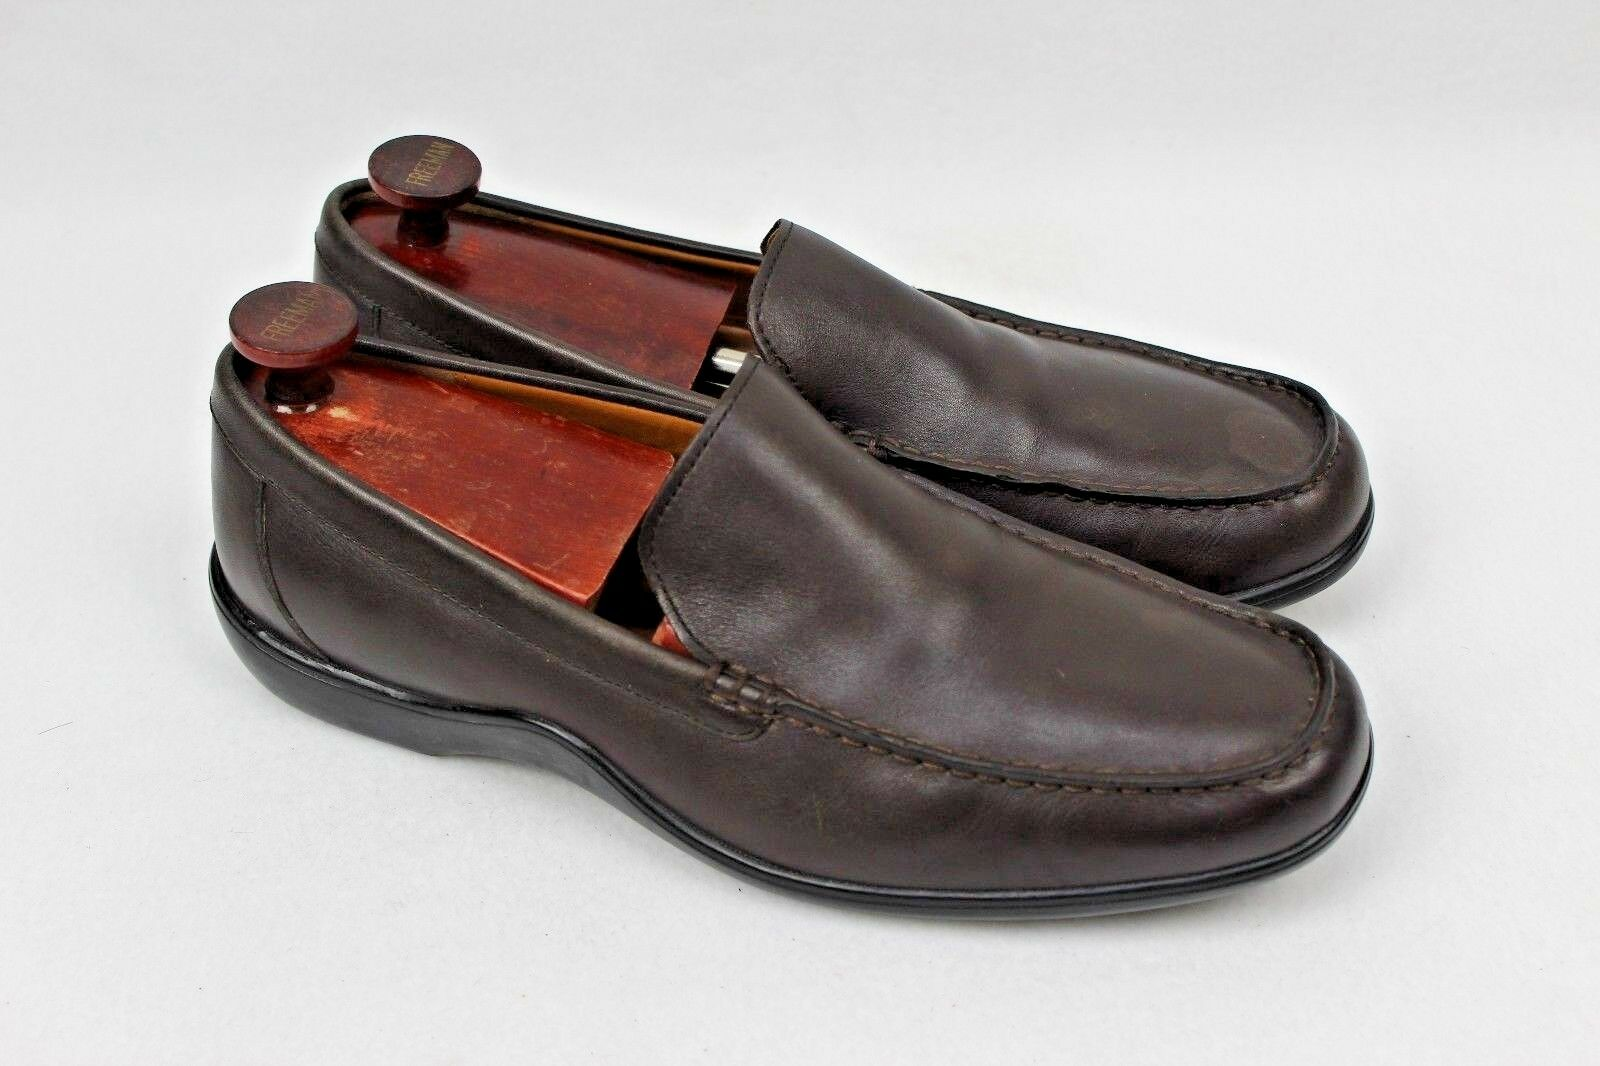 Cole Haan Men's Moc Toe Slip On Loafer Dark Brown Leather Size 11.5 M CO 7379